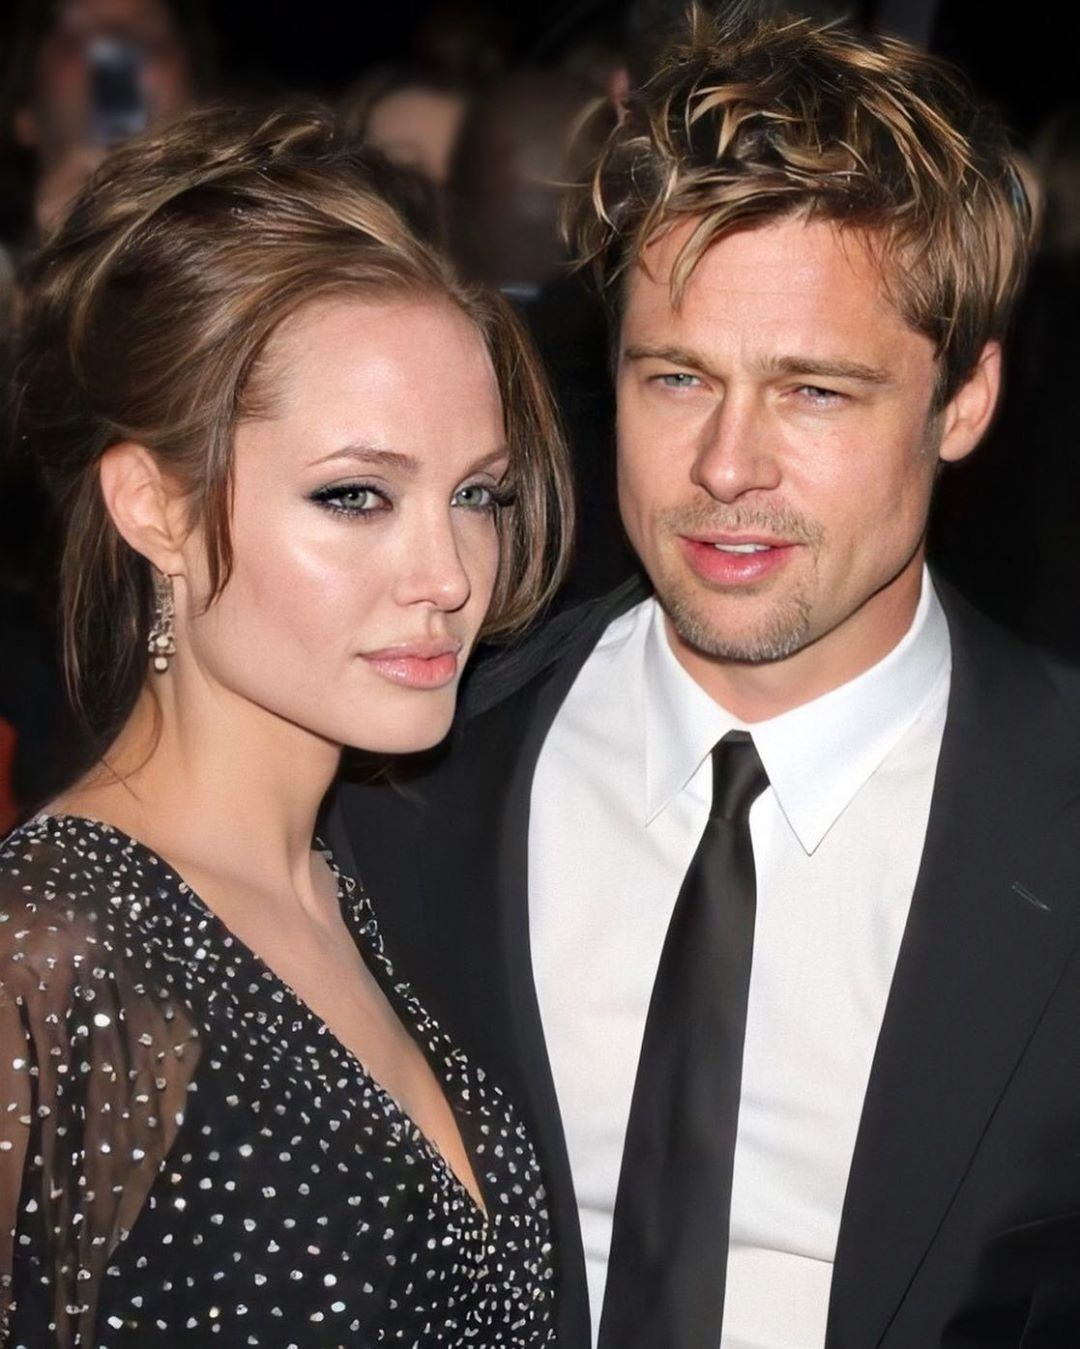 ¿Al fin regresaron? Revelan fotos de Brad Pitt saliendo de casa de Angelina